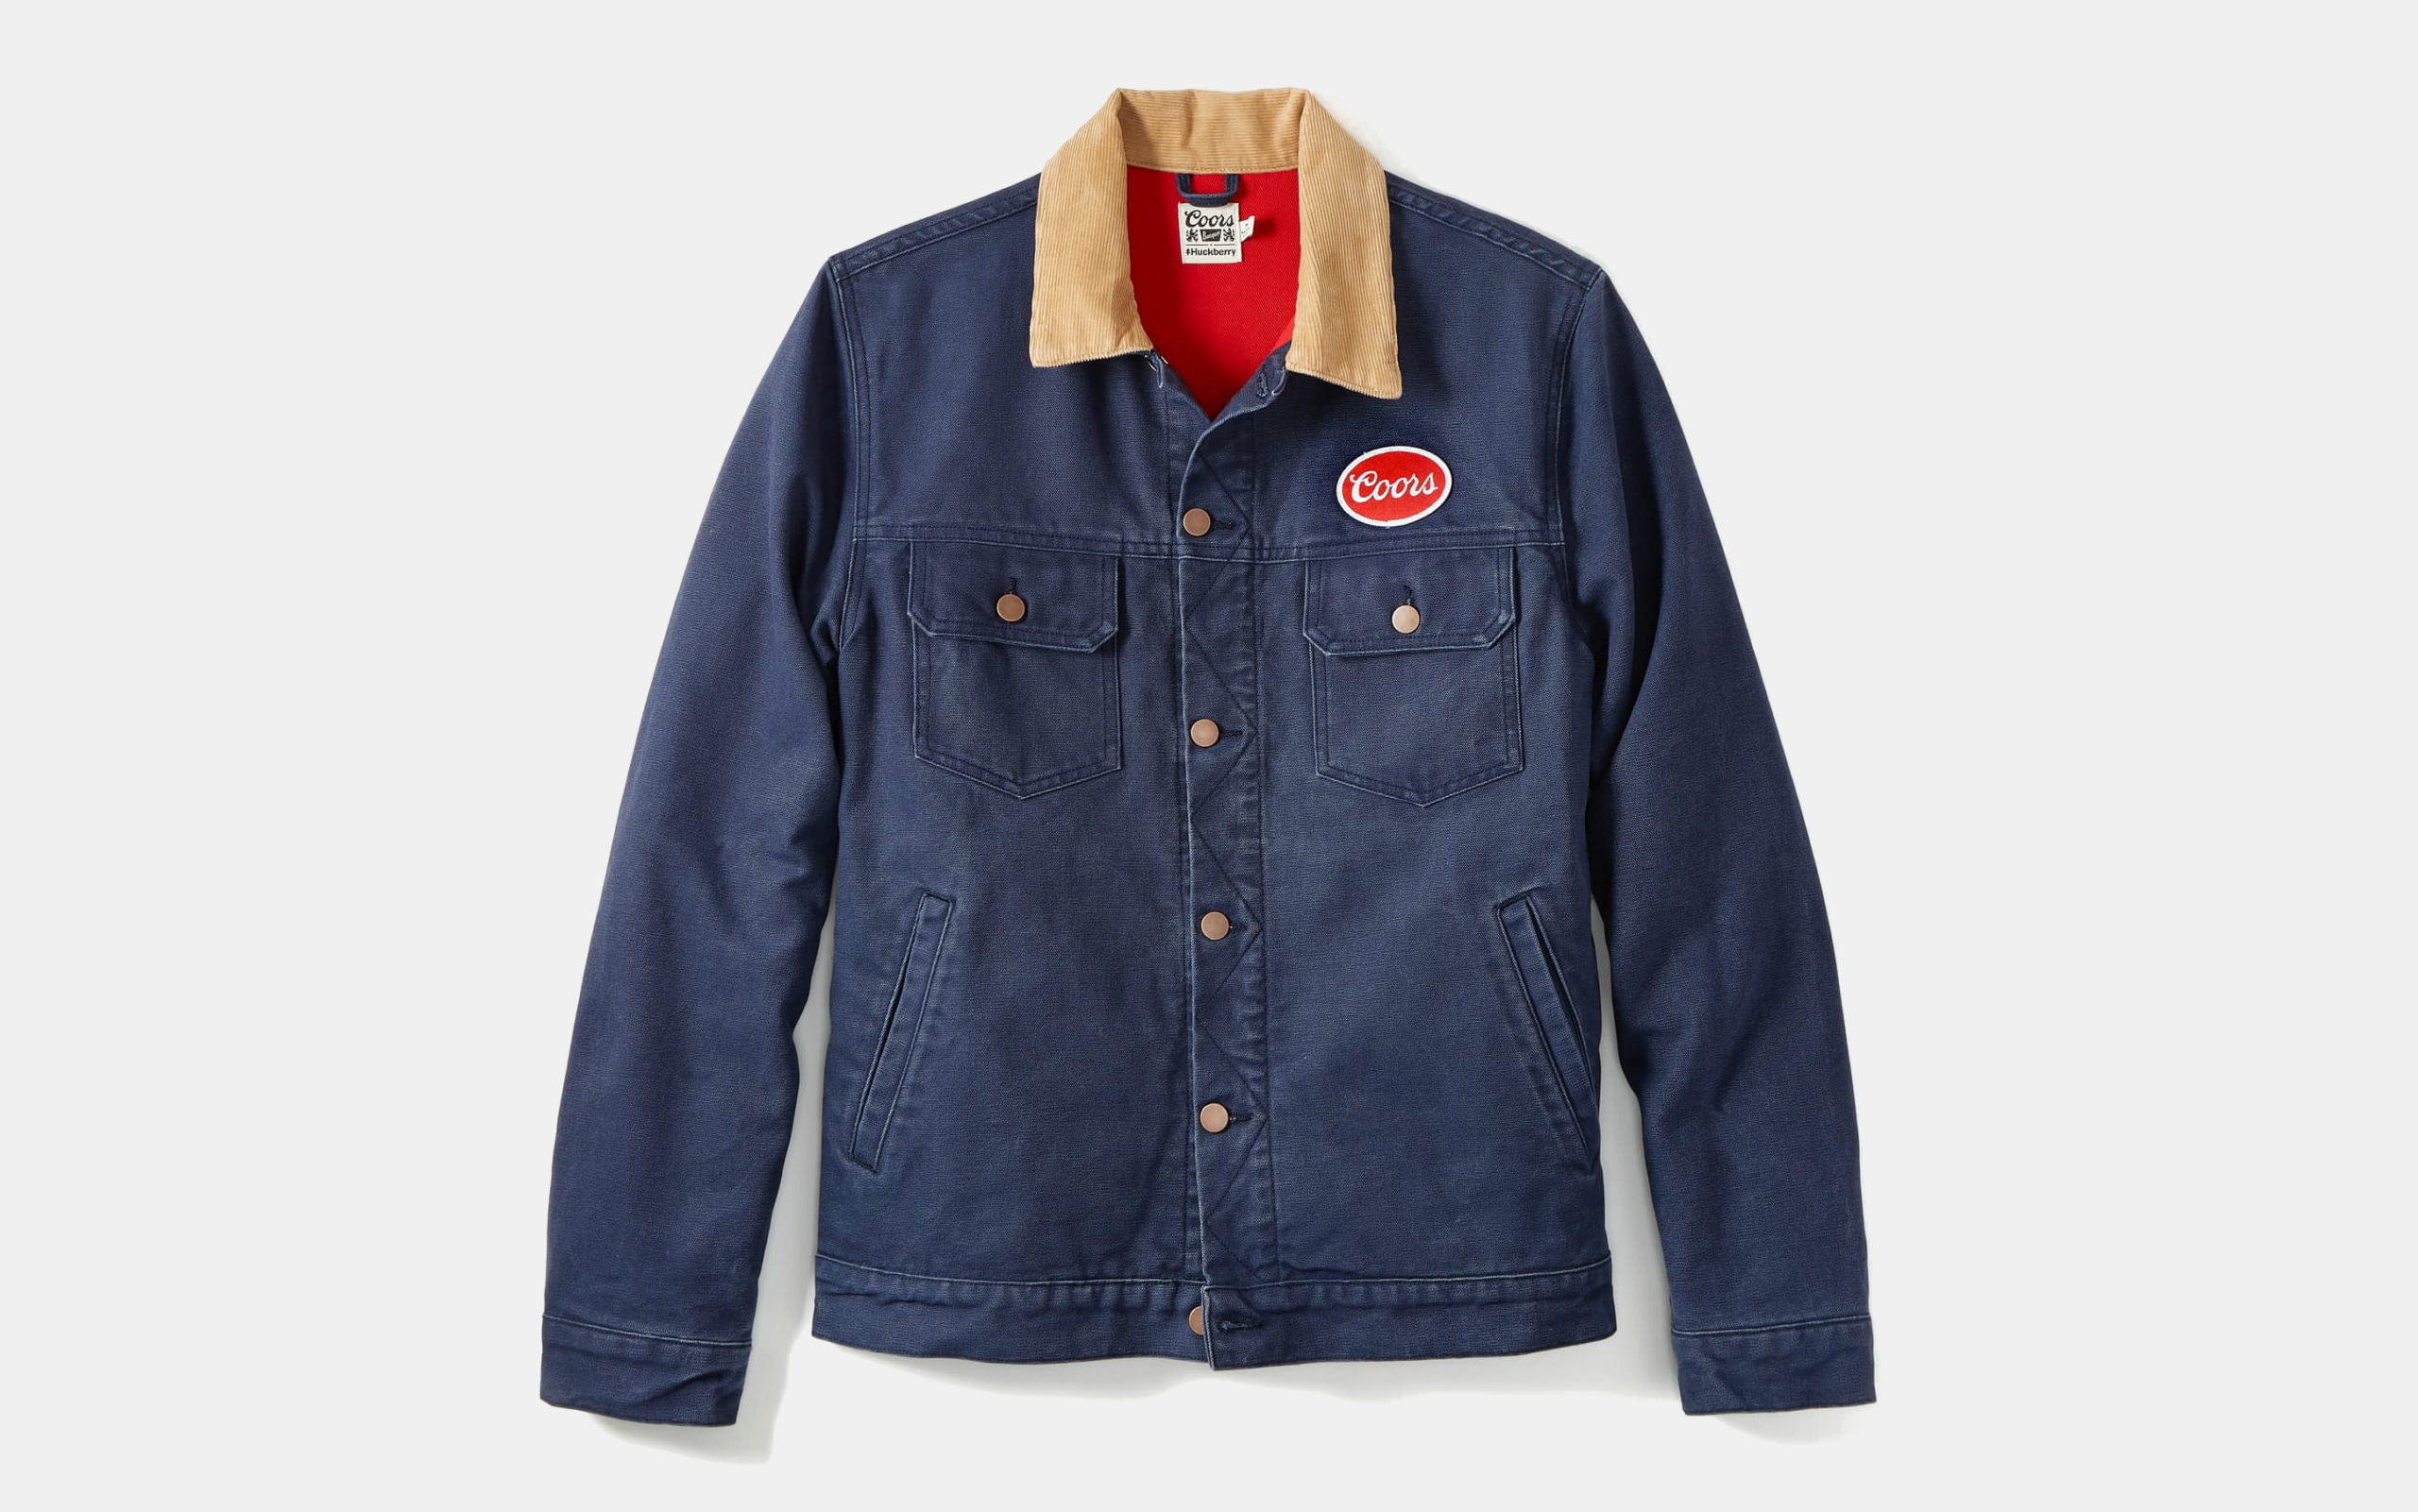 Huckberry x Coors Banquet Trucker Jacket